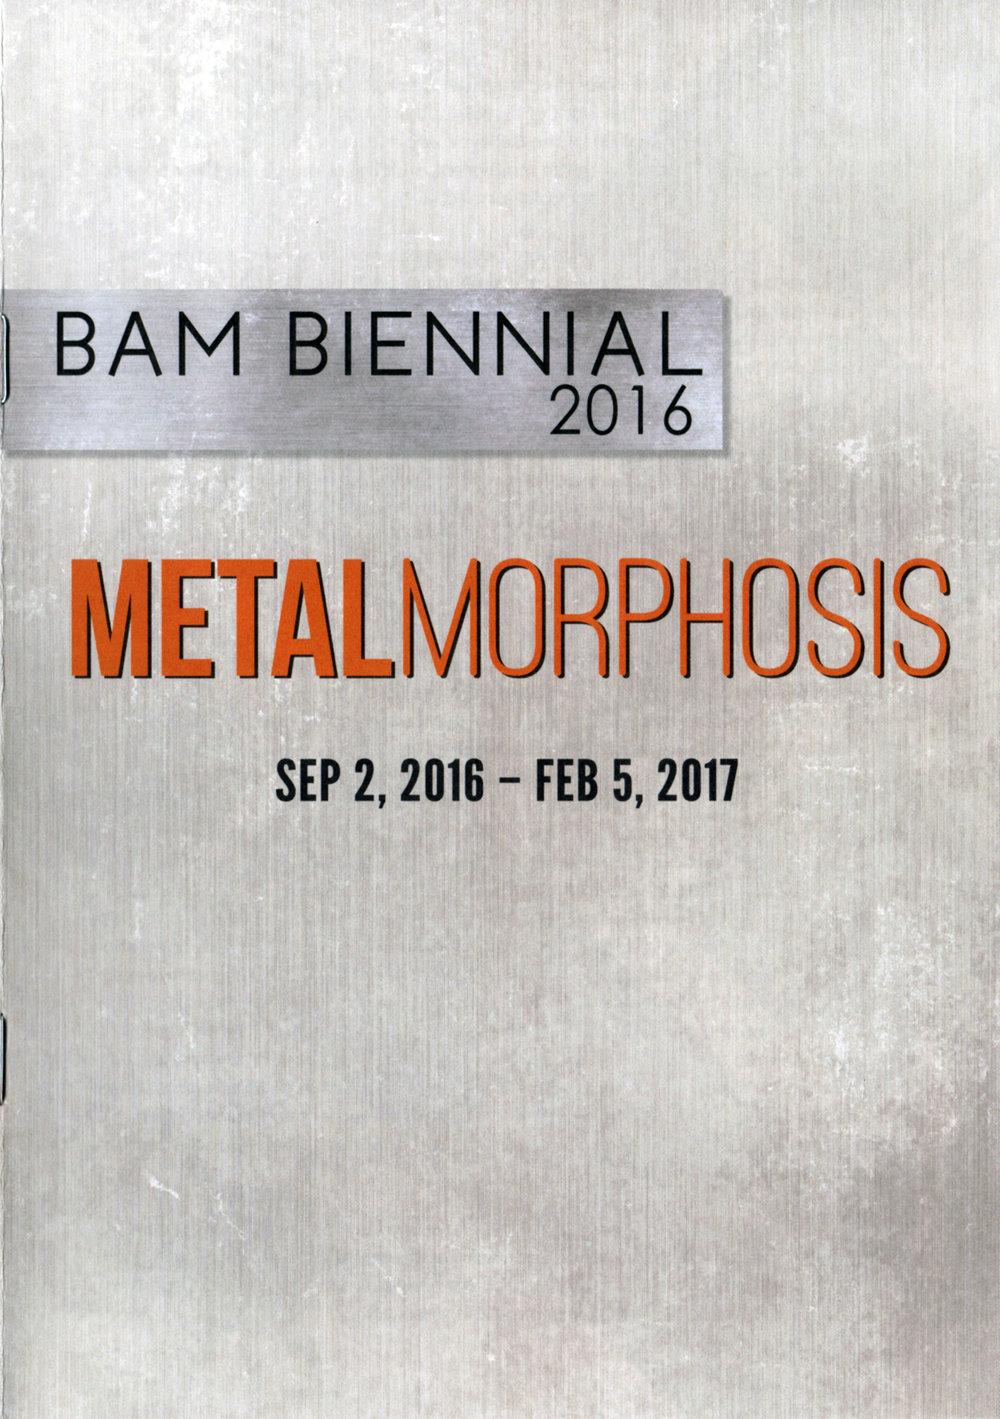 BAM Biennial 2016: MetalMorphosis